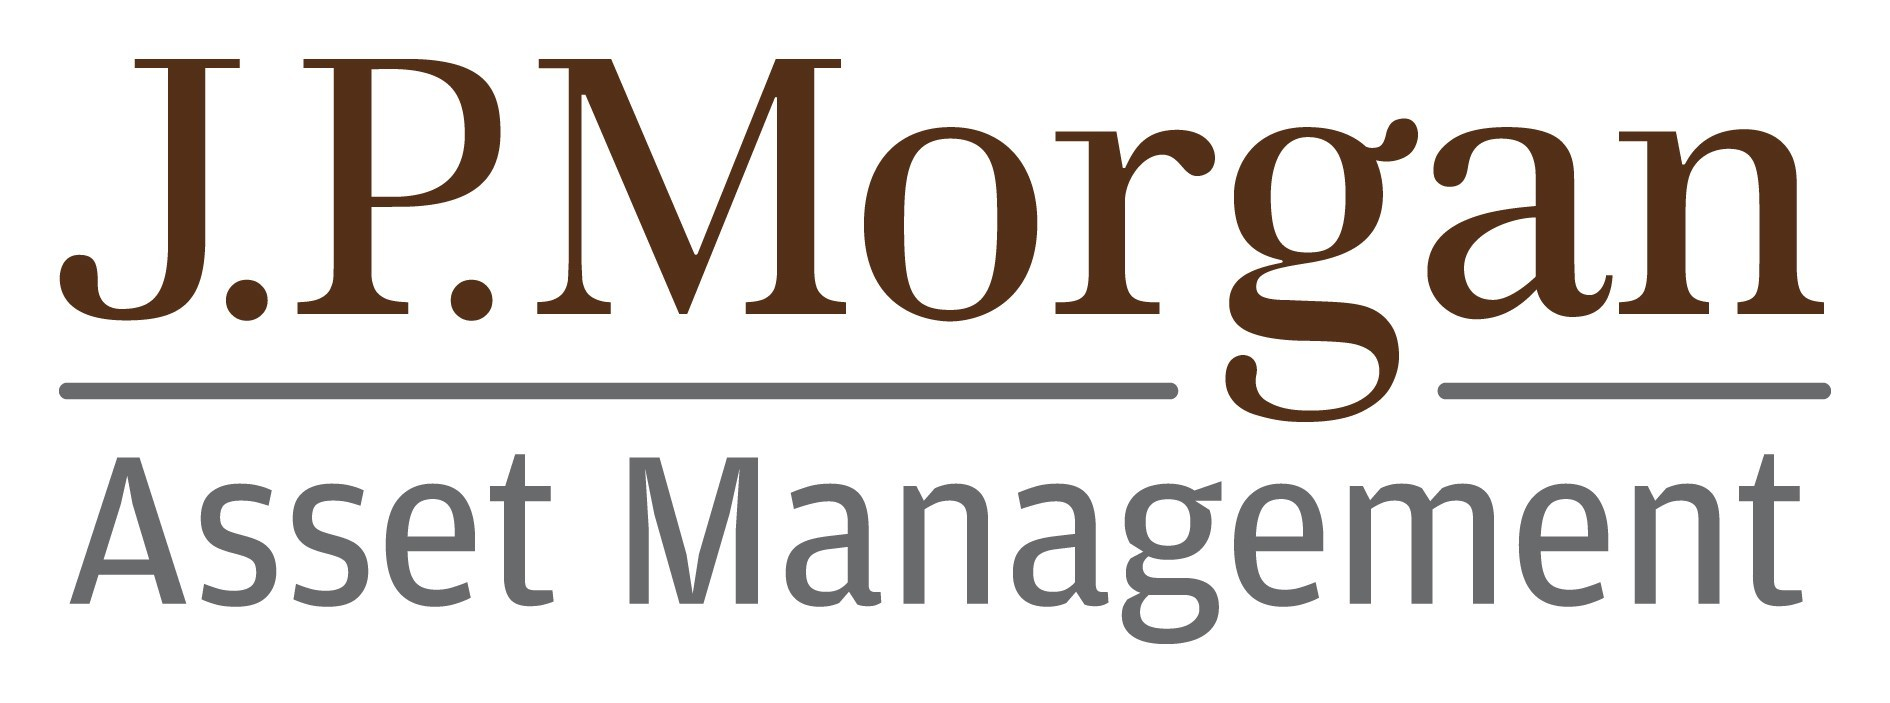 2015_9-9_JPMorgan_Logo.jpg